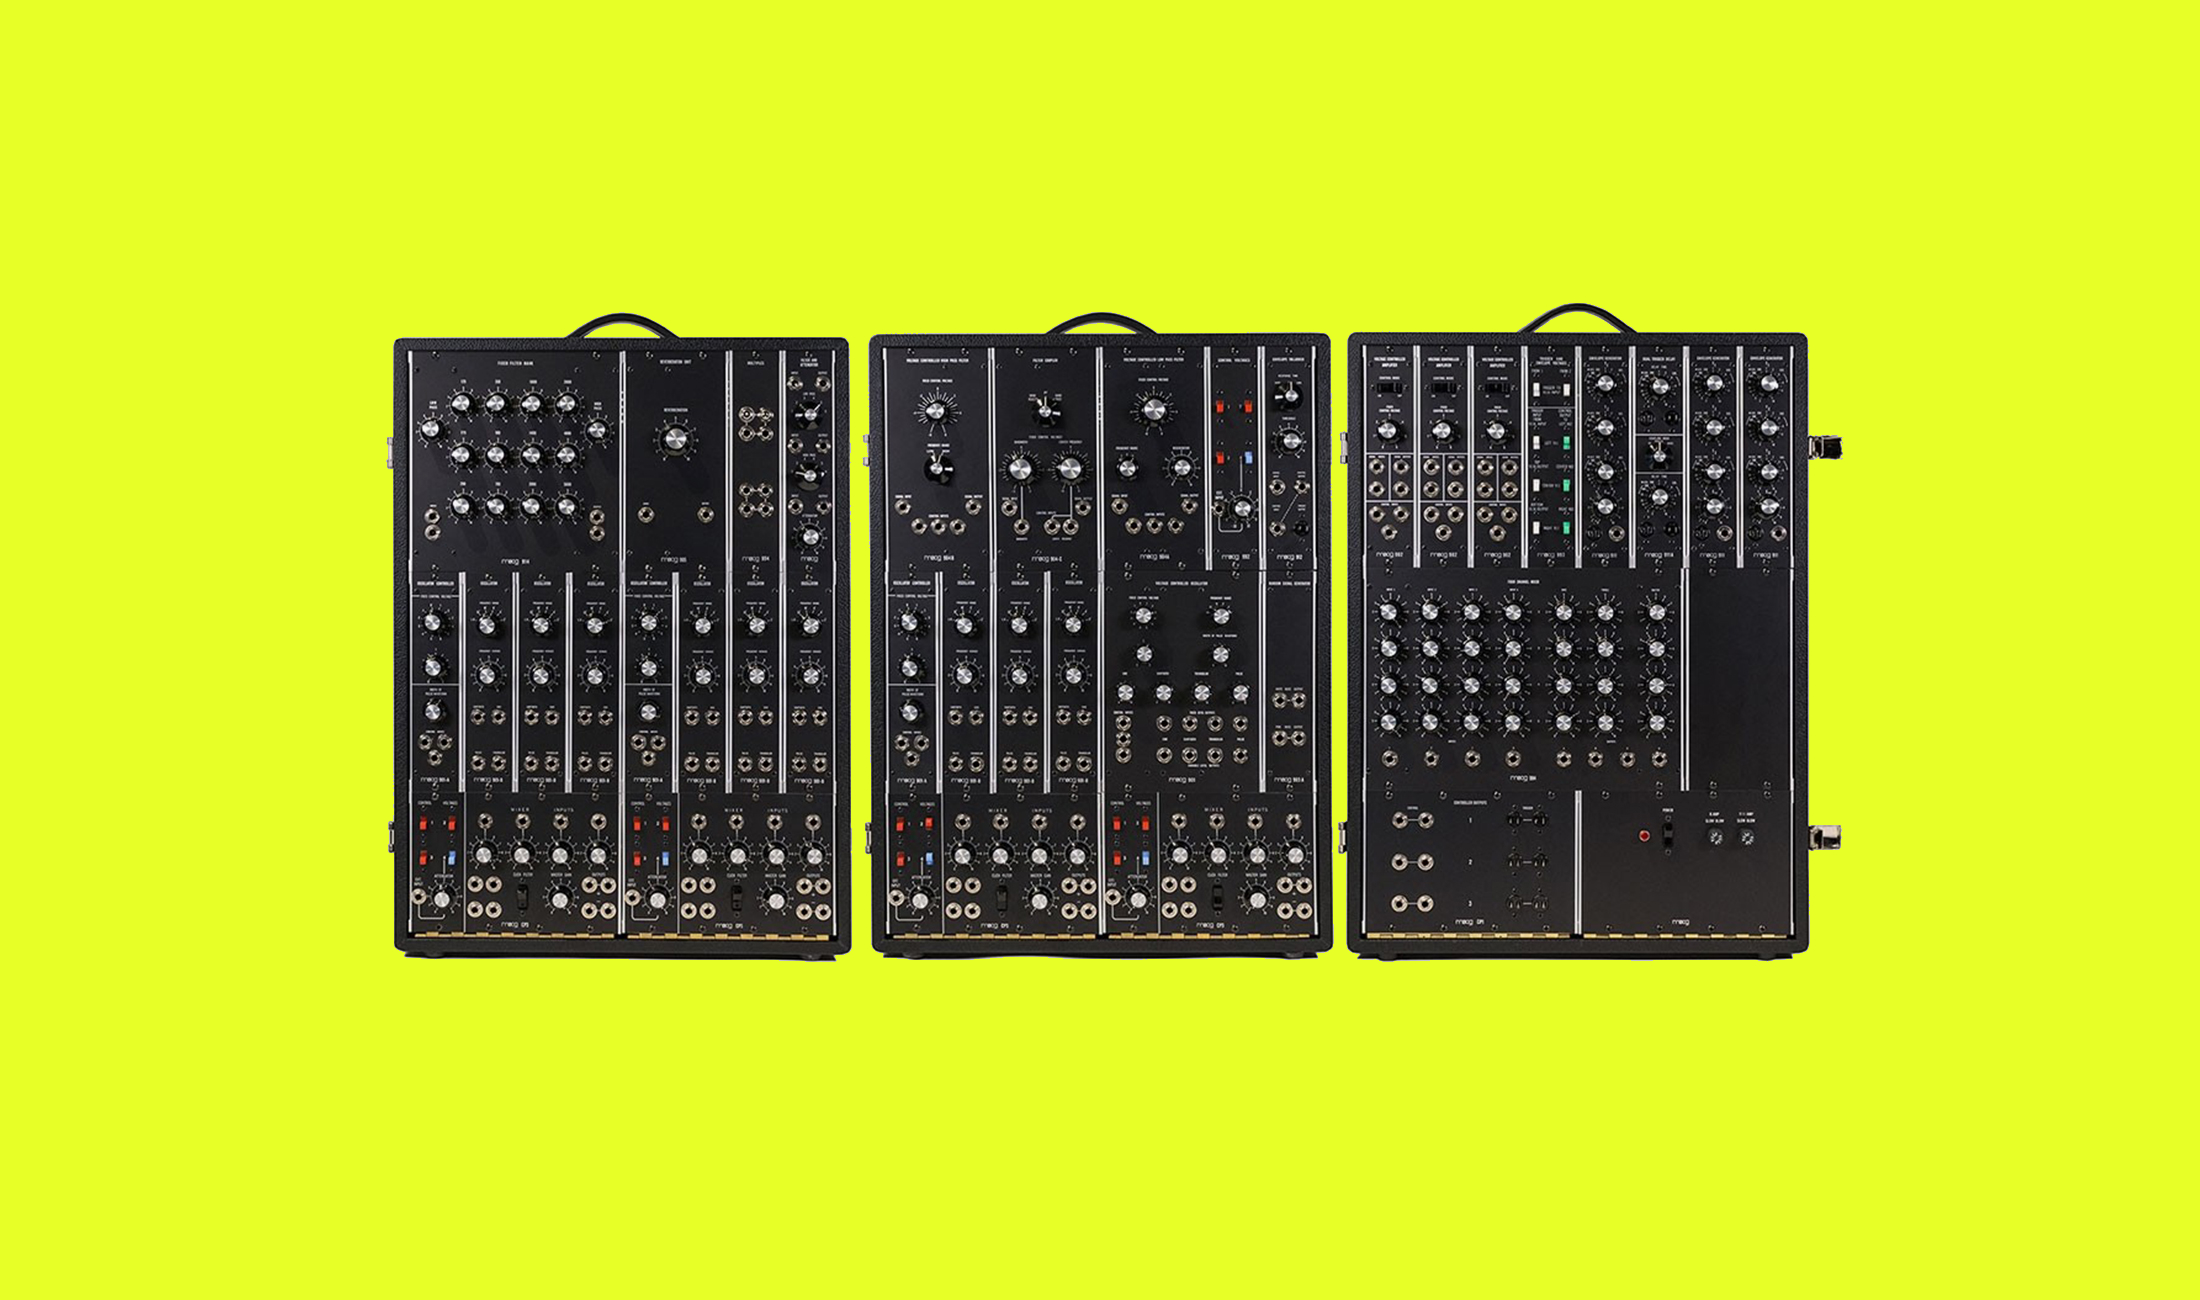 Moog kündigt Modular-Synthesizer an – für 35.000$